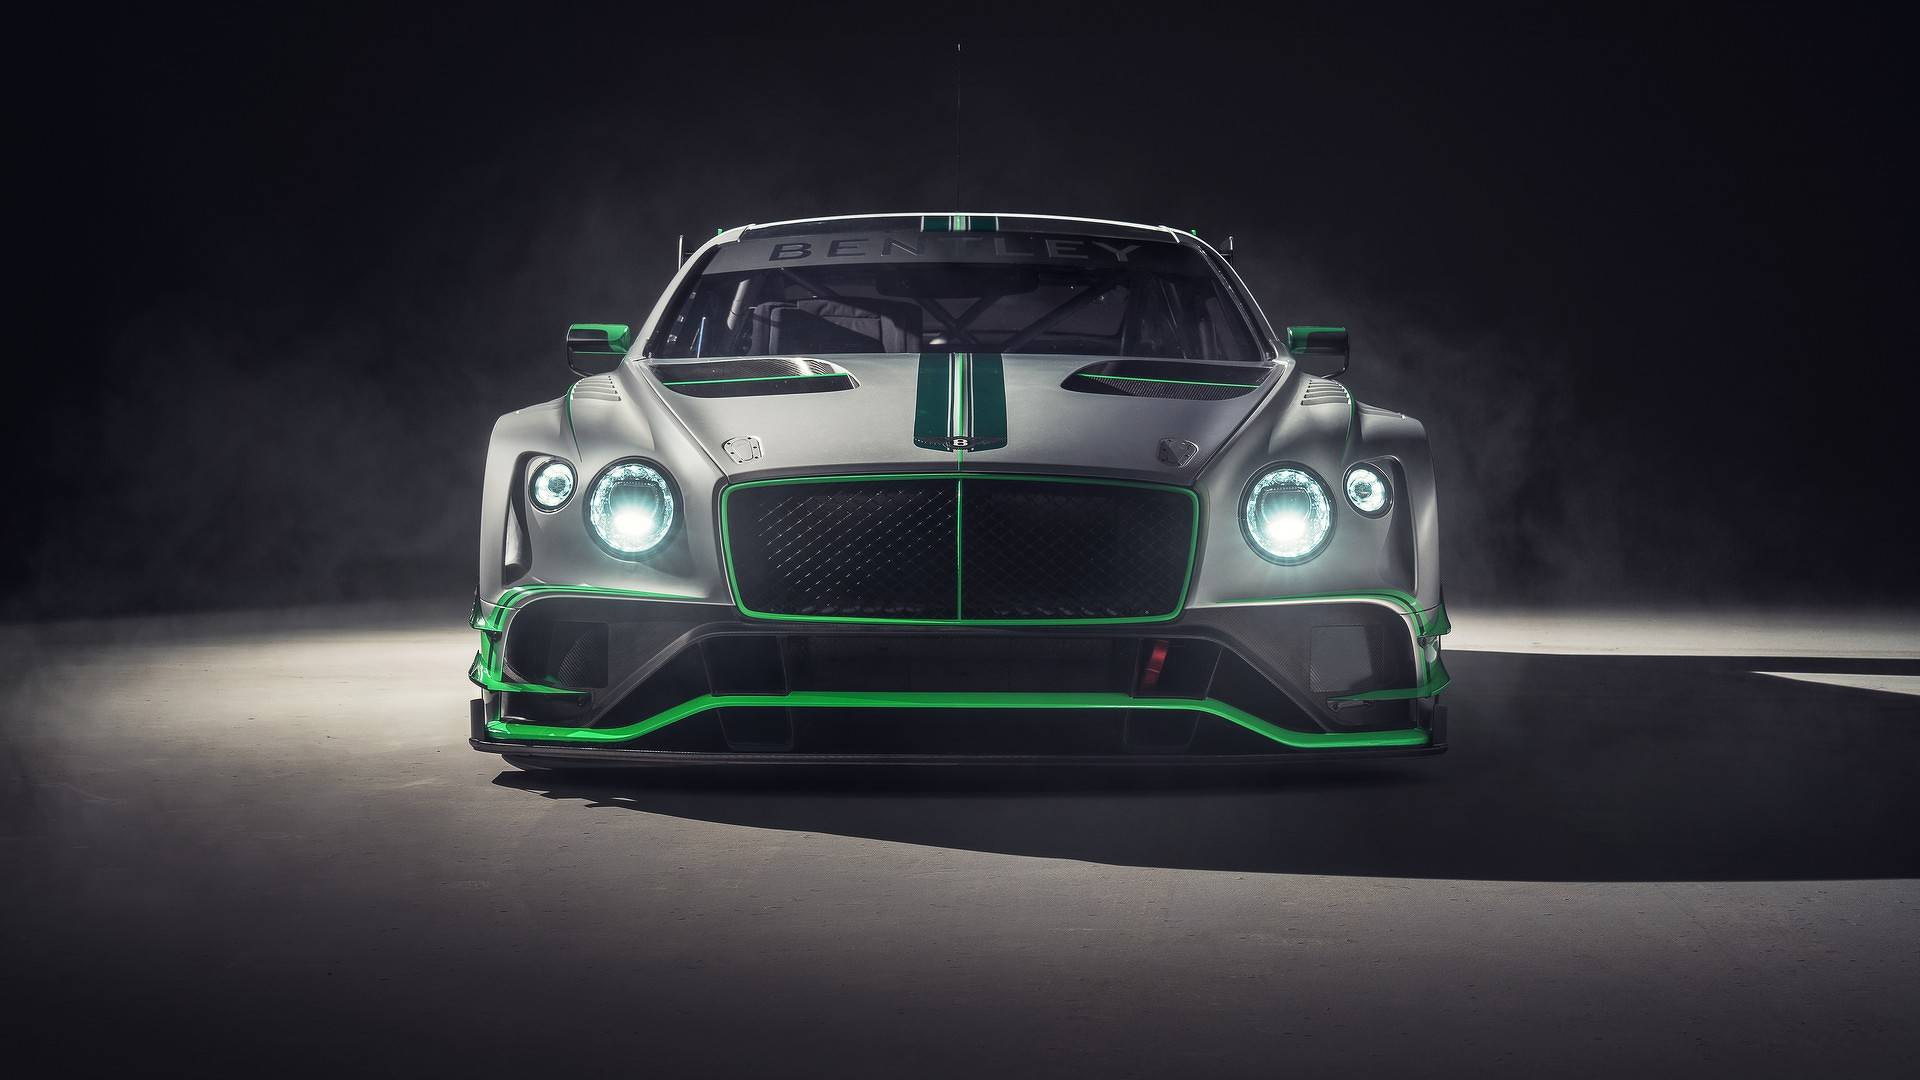 2018-bentley-continental-gt3-race-car